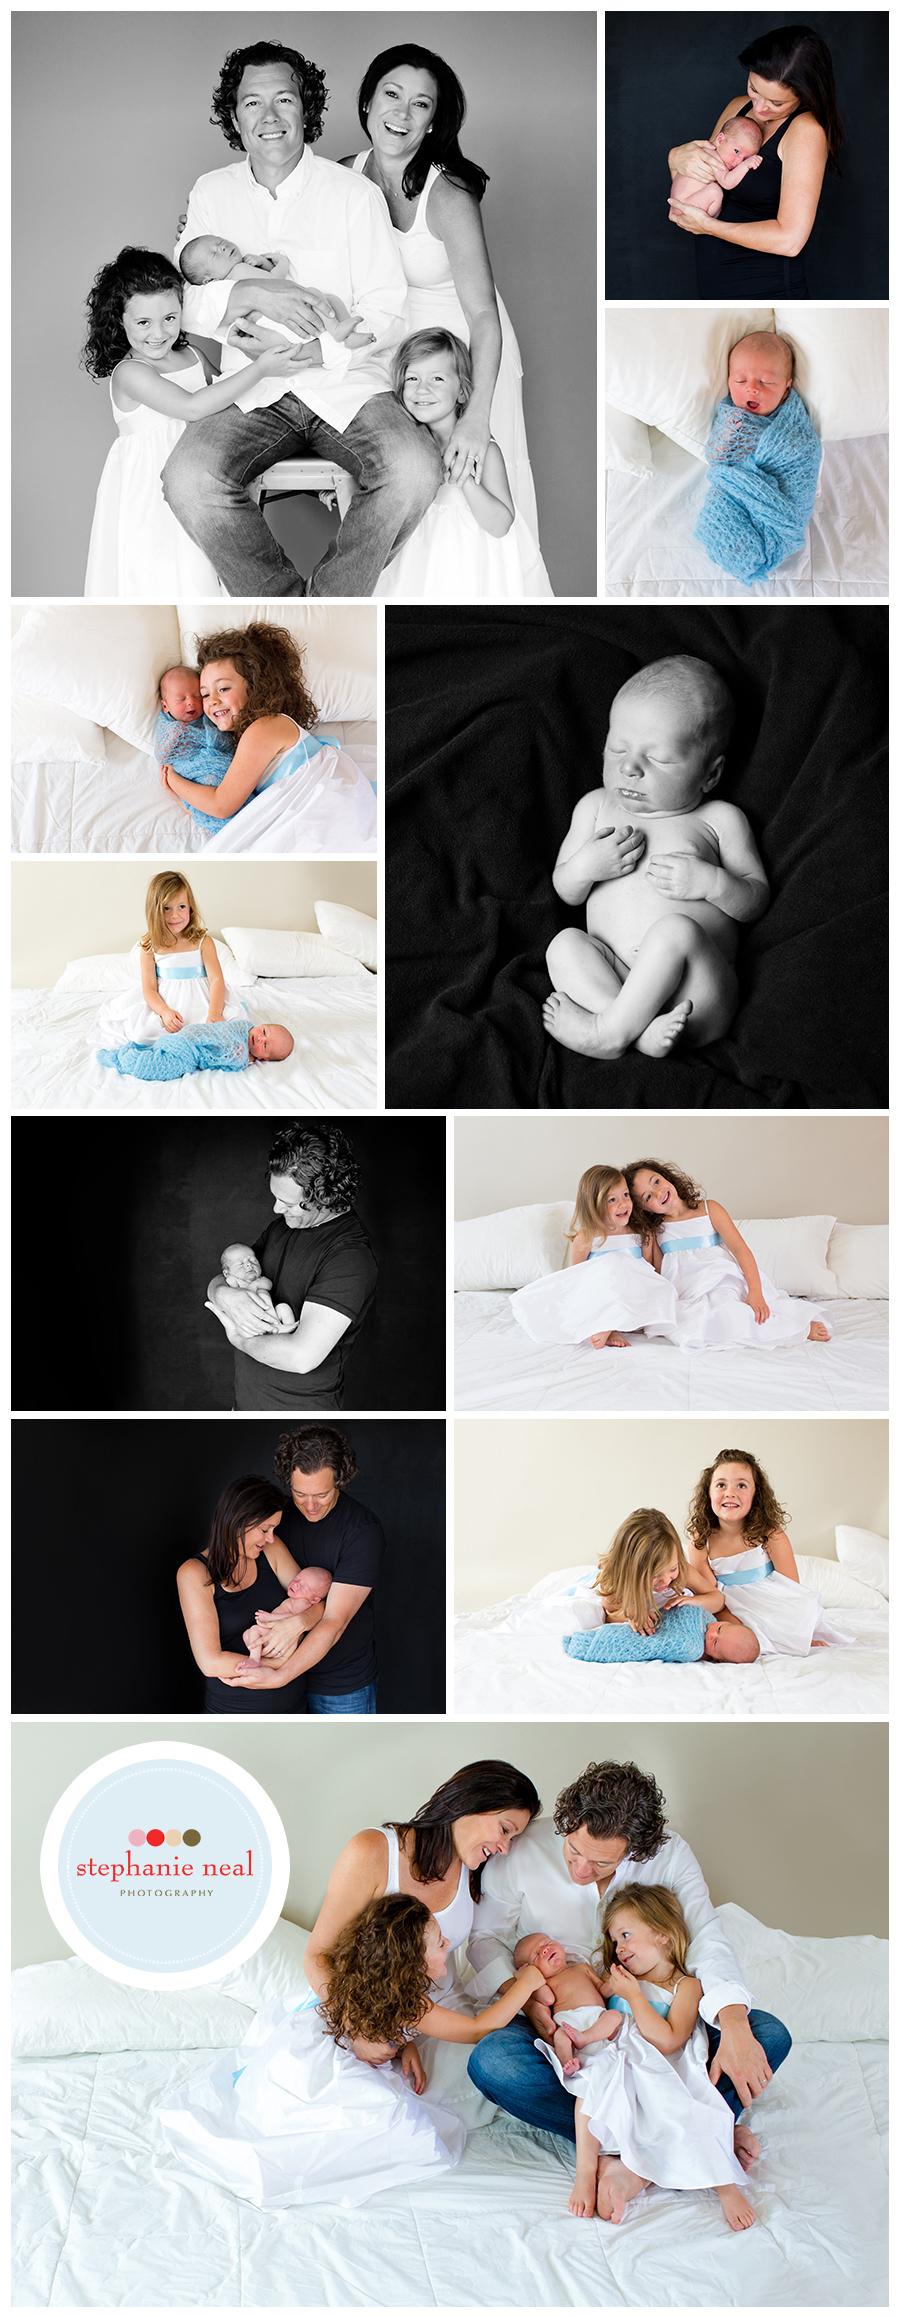 Park City, Heber, Midway Family Newborn Portrait Photographer, Stephanie Neal Photography